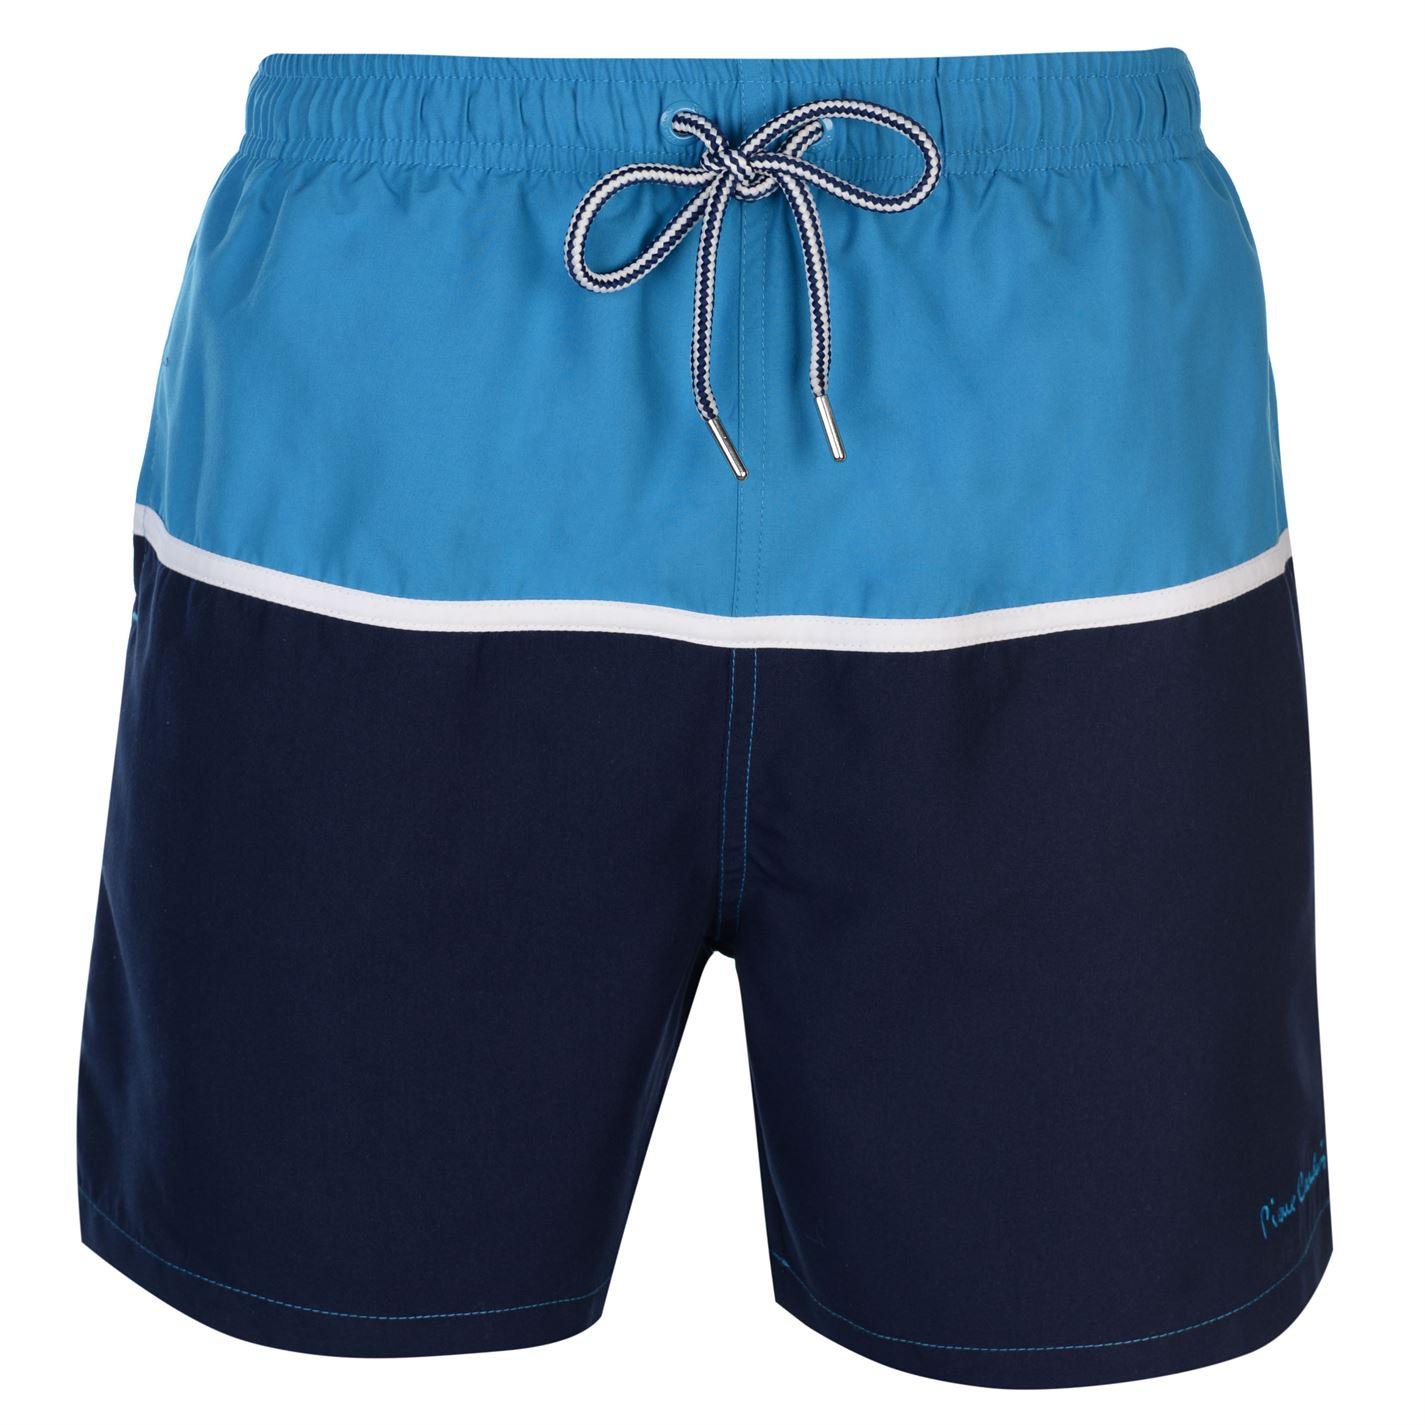 Pierre Cardin Panel Swim Shorts Mens